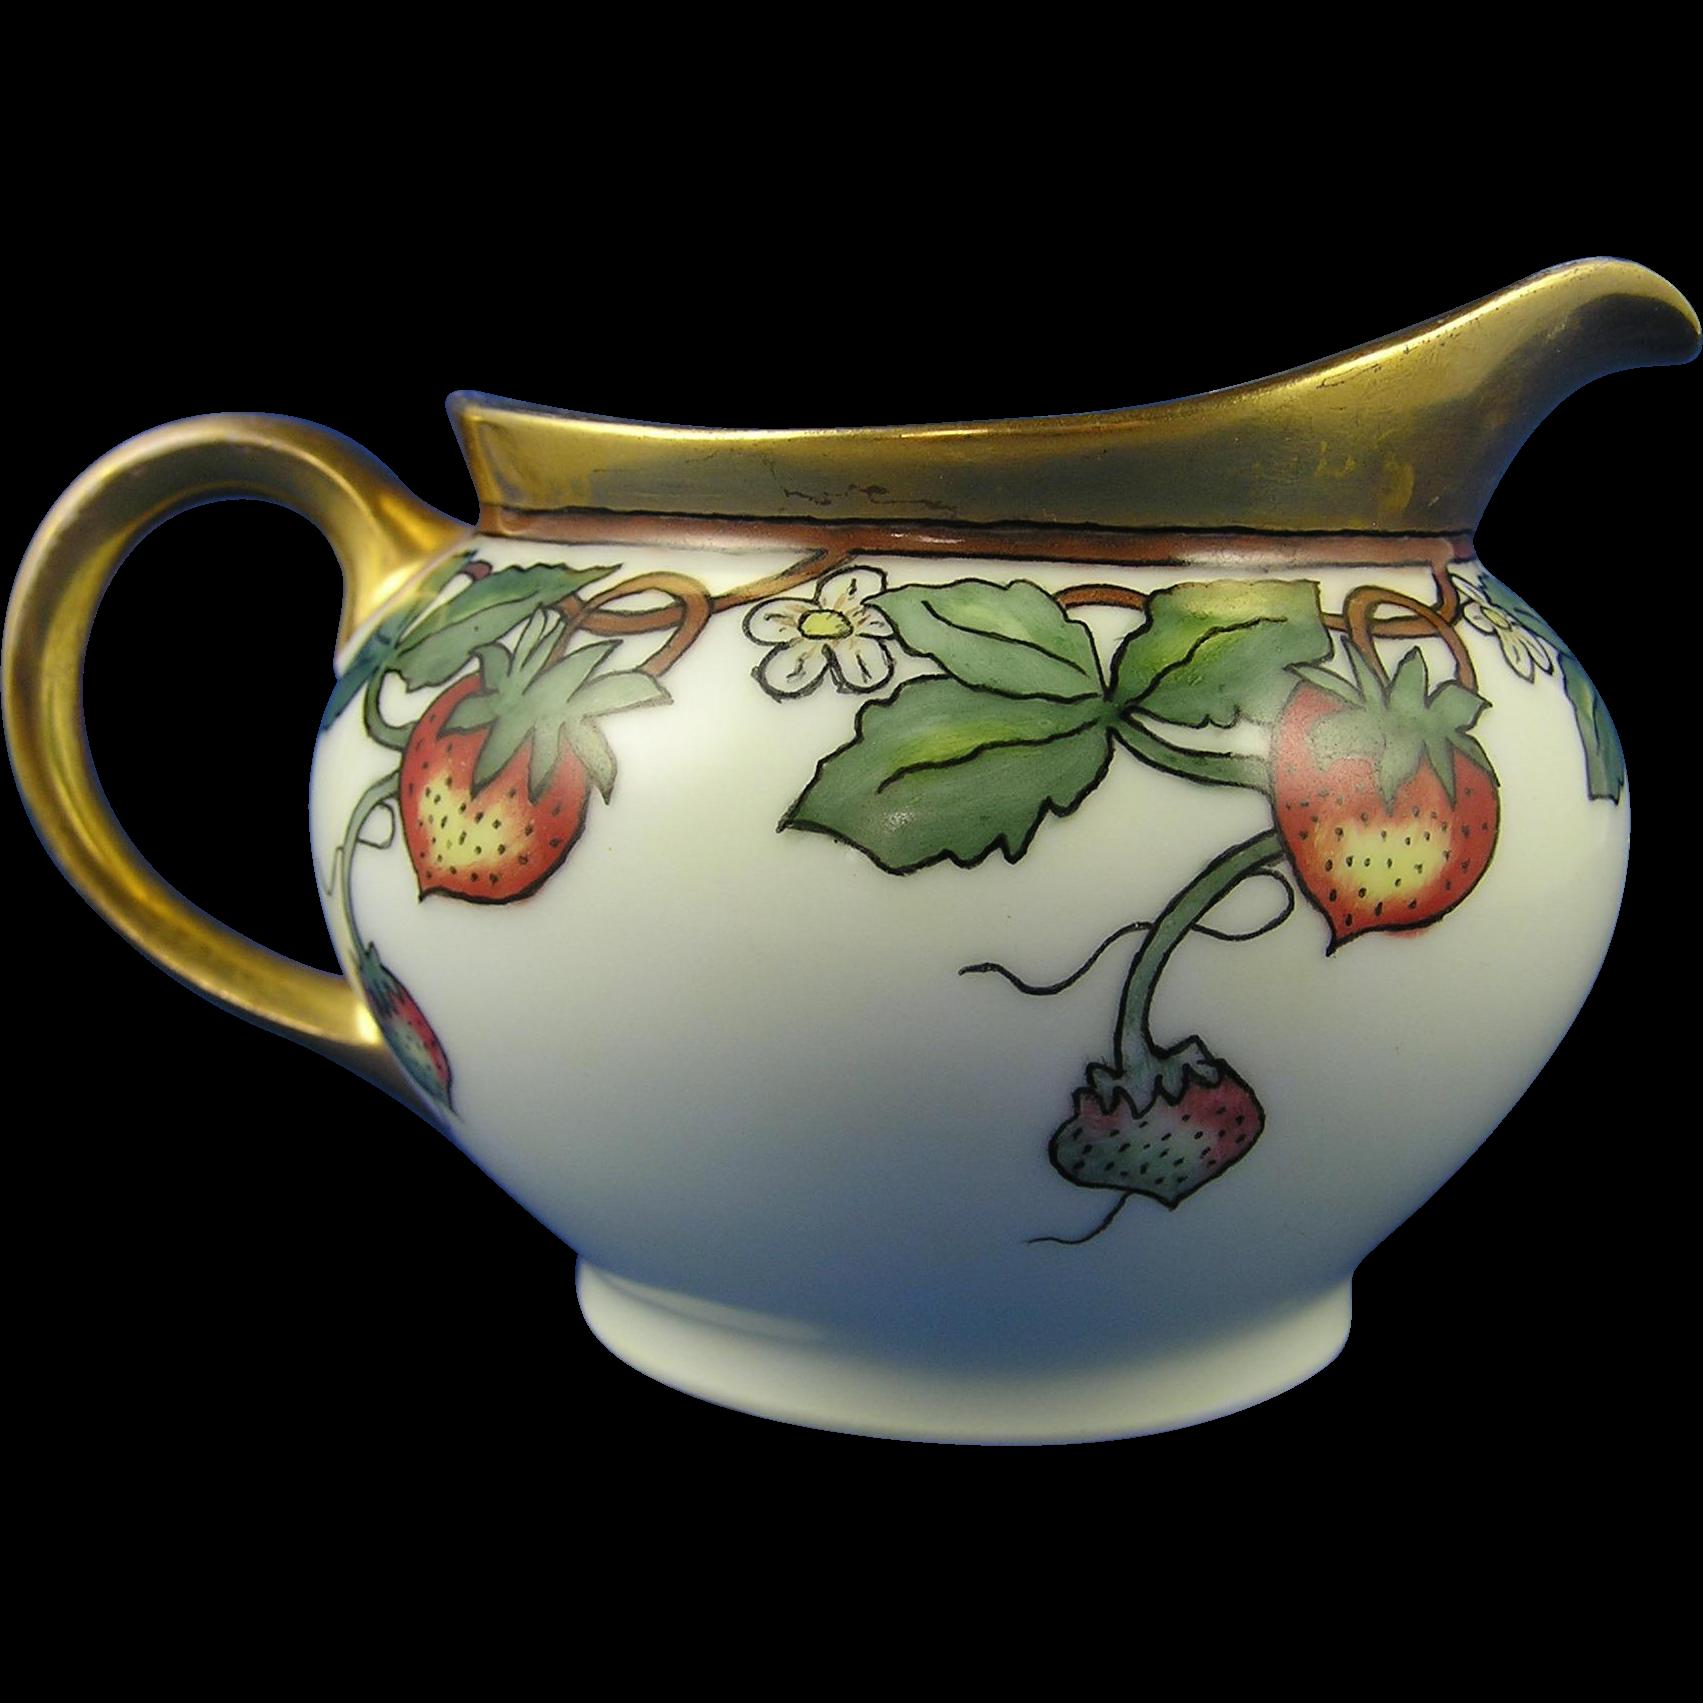 Thomas Bavaria Arts & Crafts Strawberry Design Pitcher (c.1908-1930)